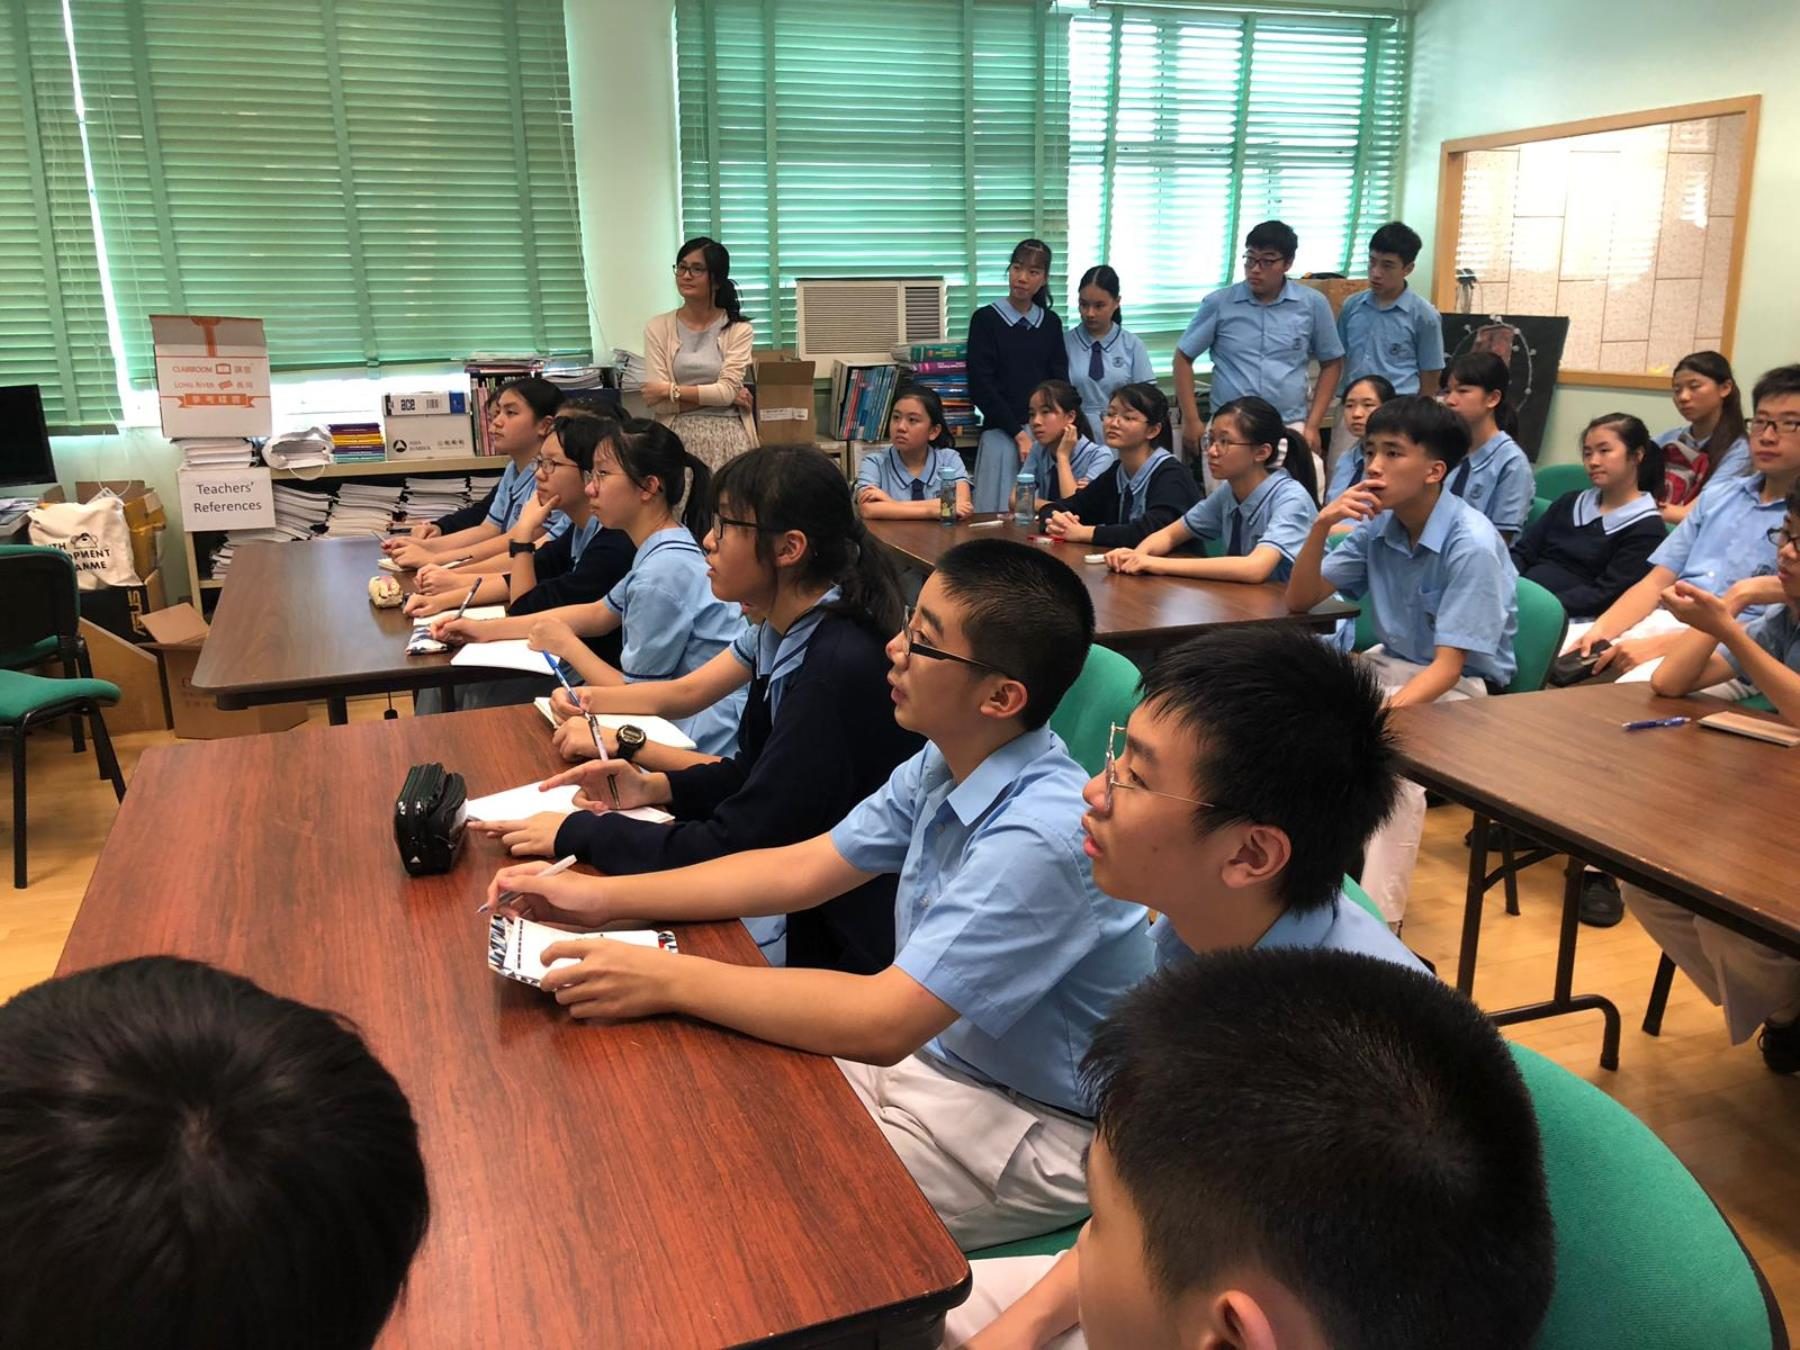 http://npc.edu.hk/sites/default/files/img-20190626-wa0041.jpg